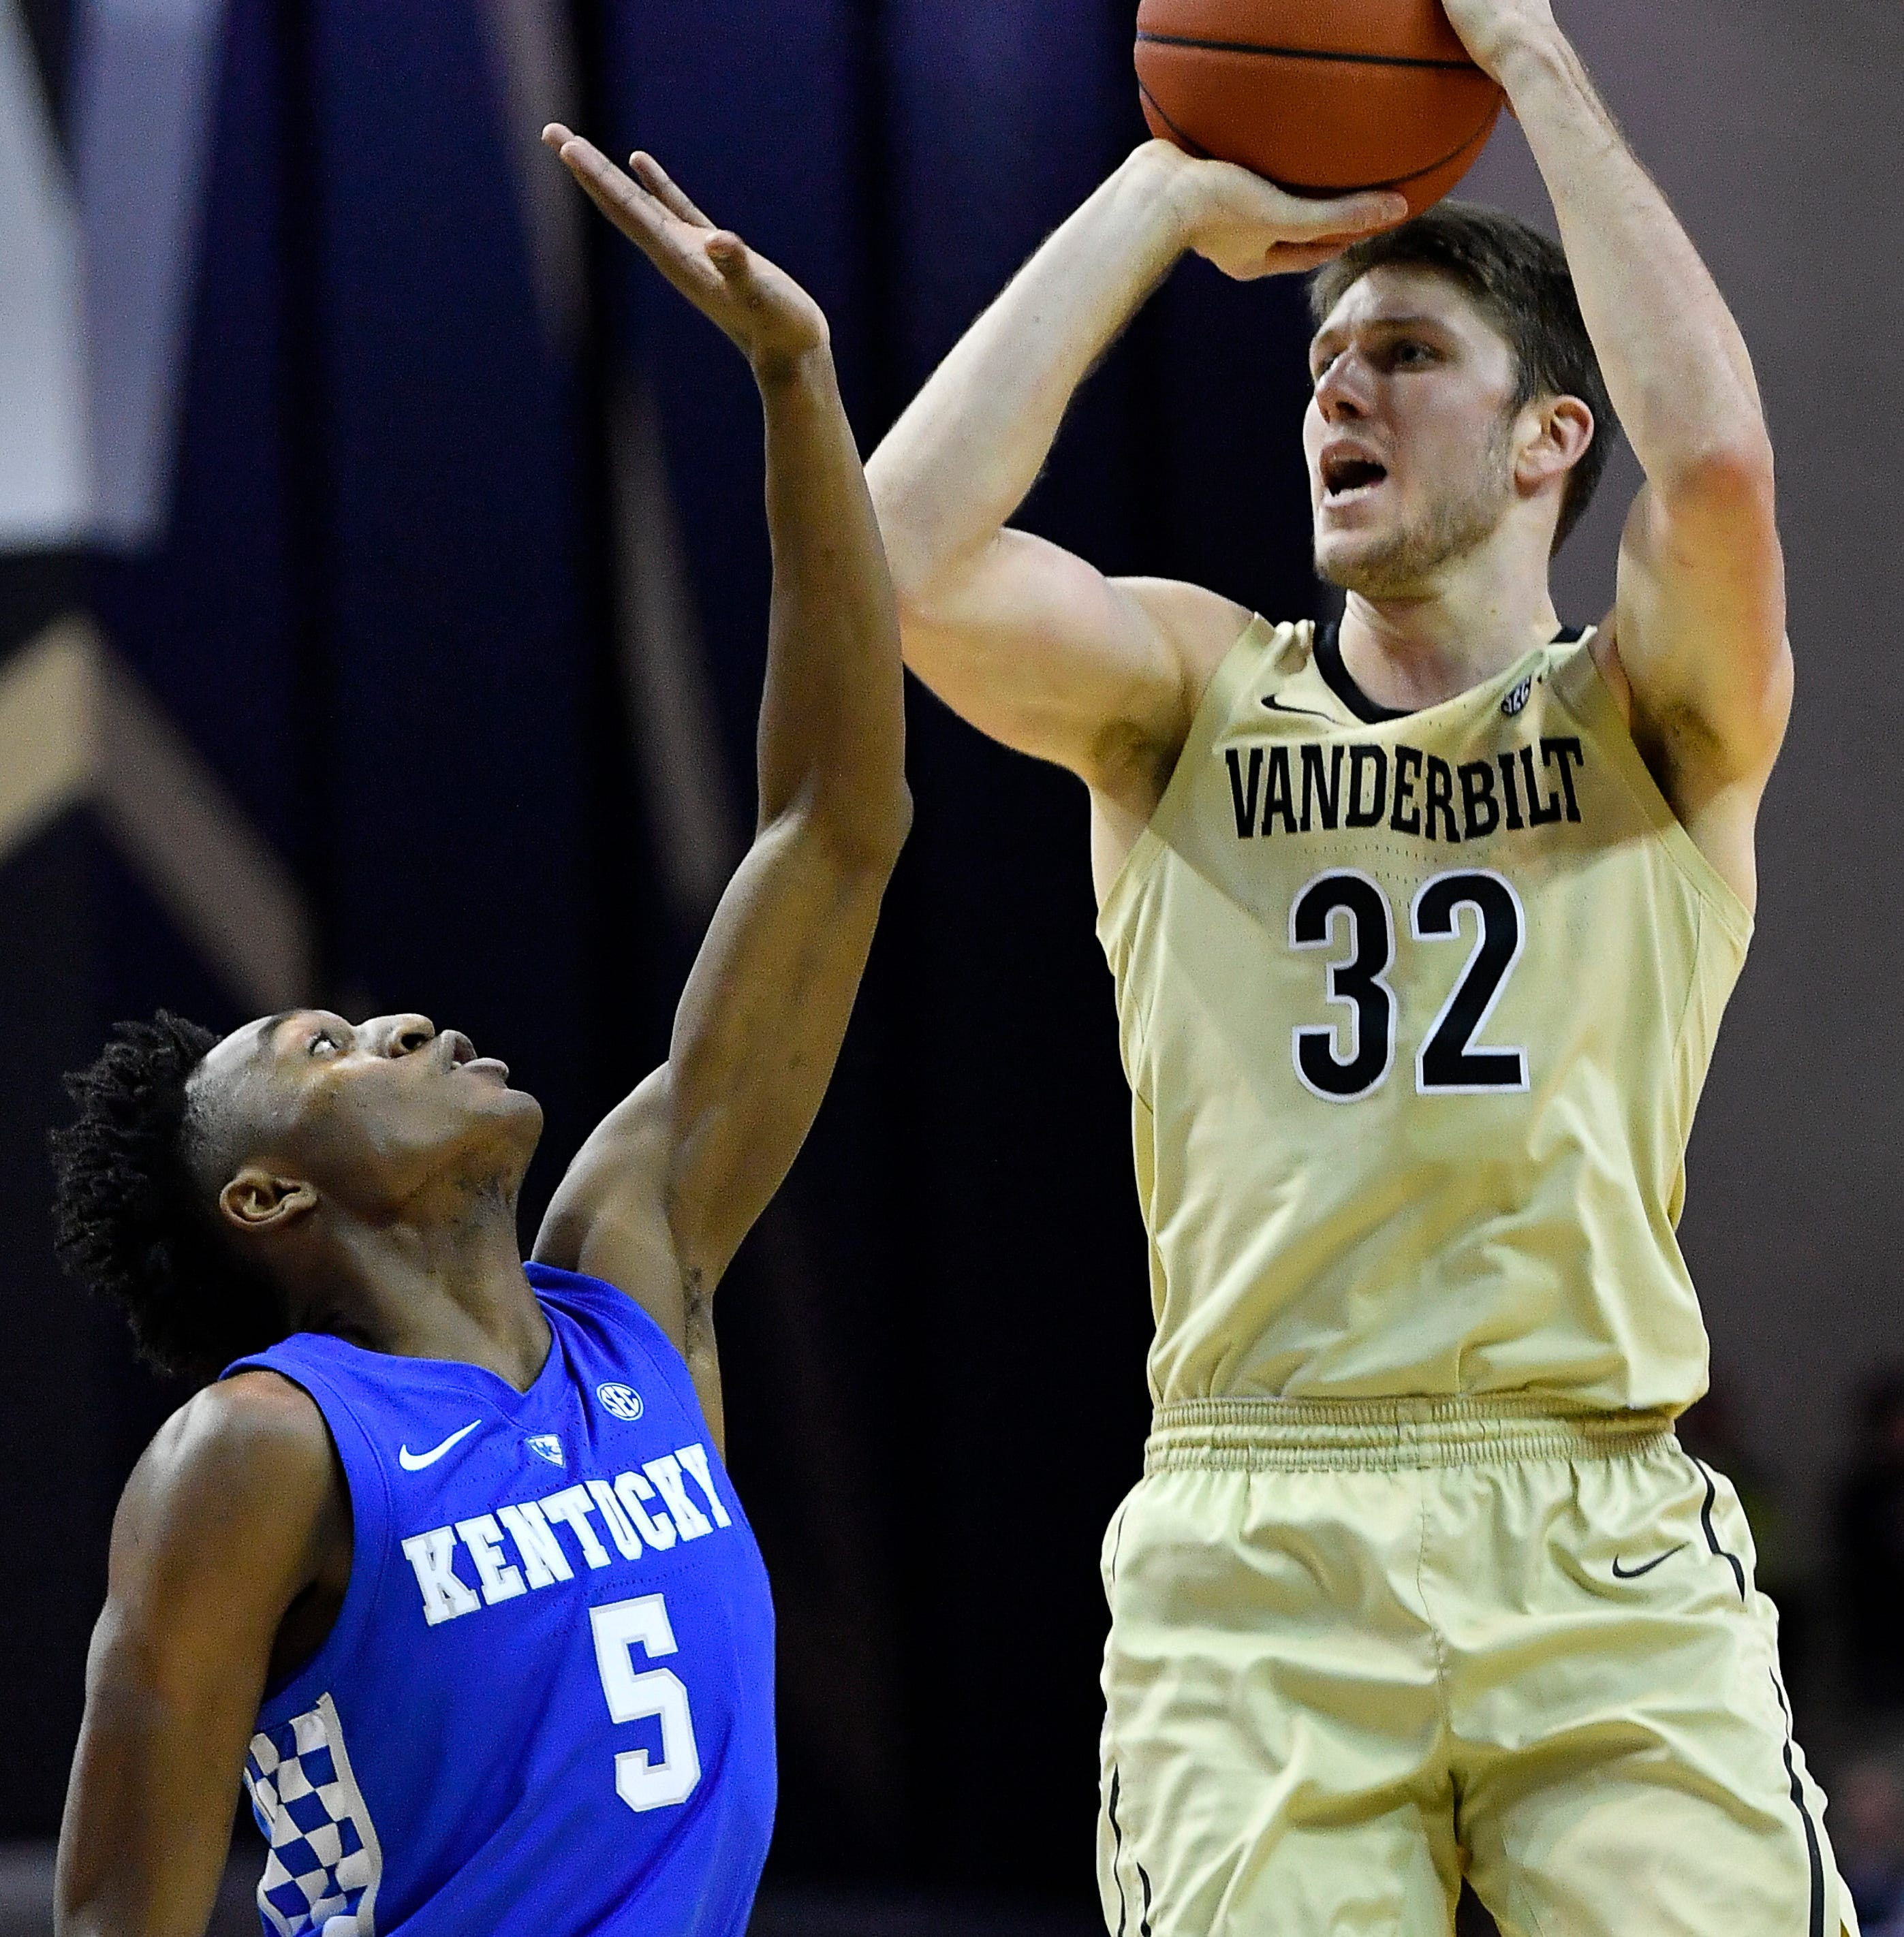 Vanderbilt basketball: Matt Ryan transfers to Chattanooga, trims Jerry Stackhouse's first team